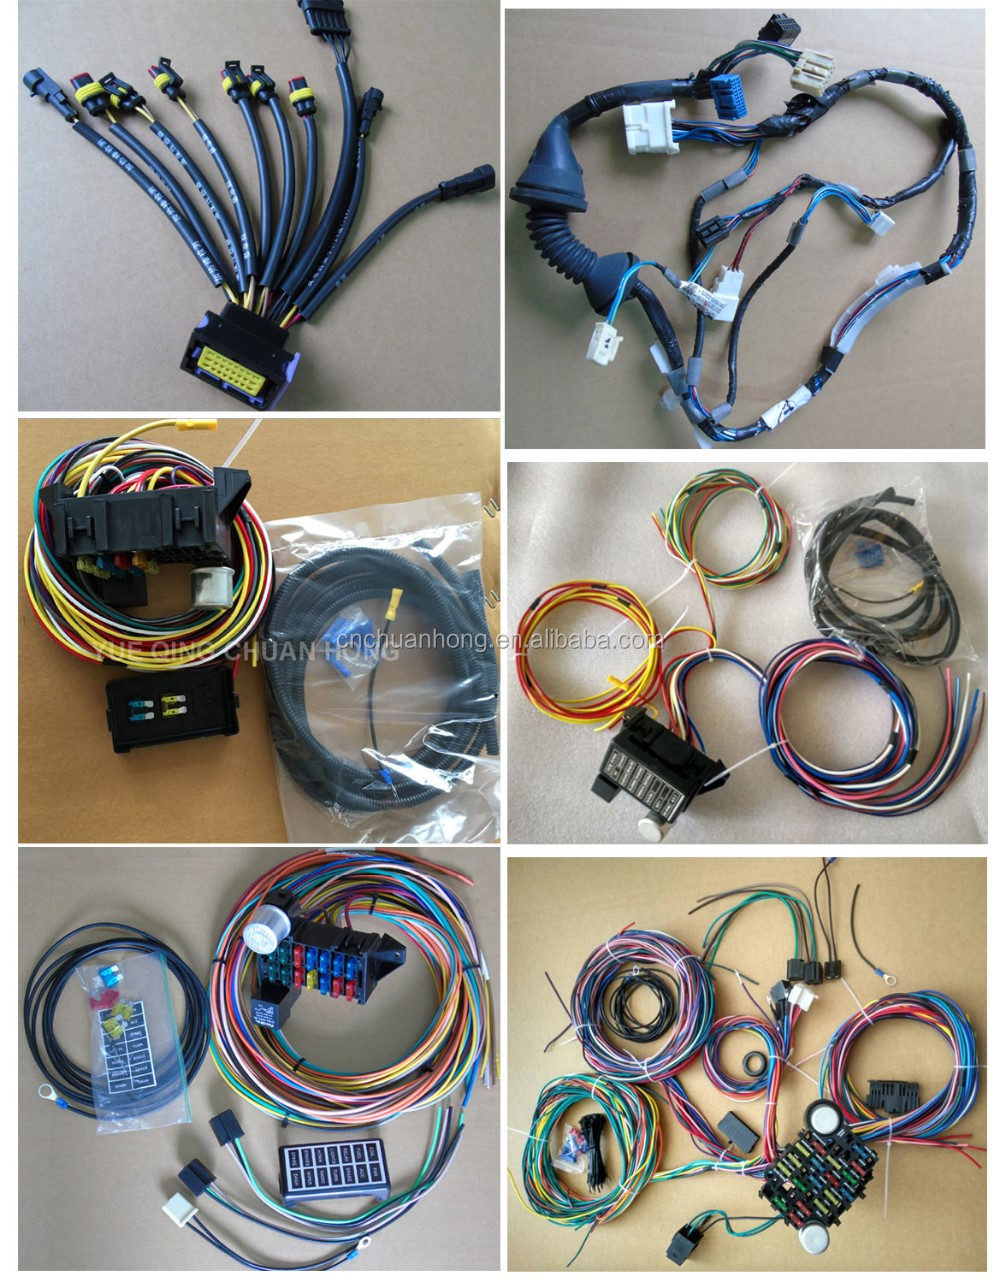 medium resolution of wiring specialties engine tranny harness 2jzgte vvti into universal application